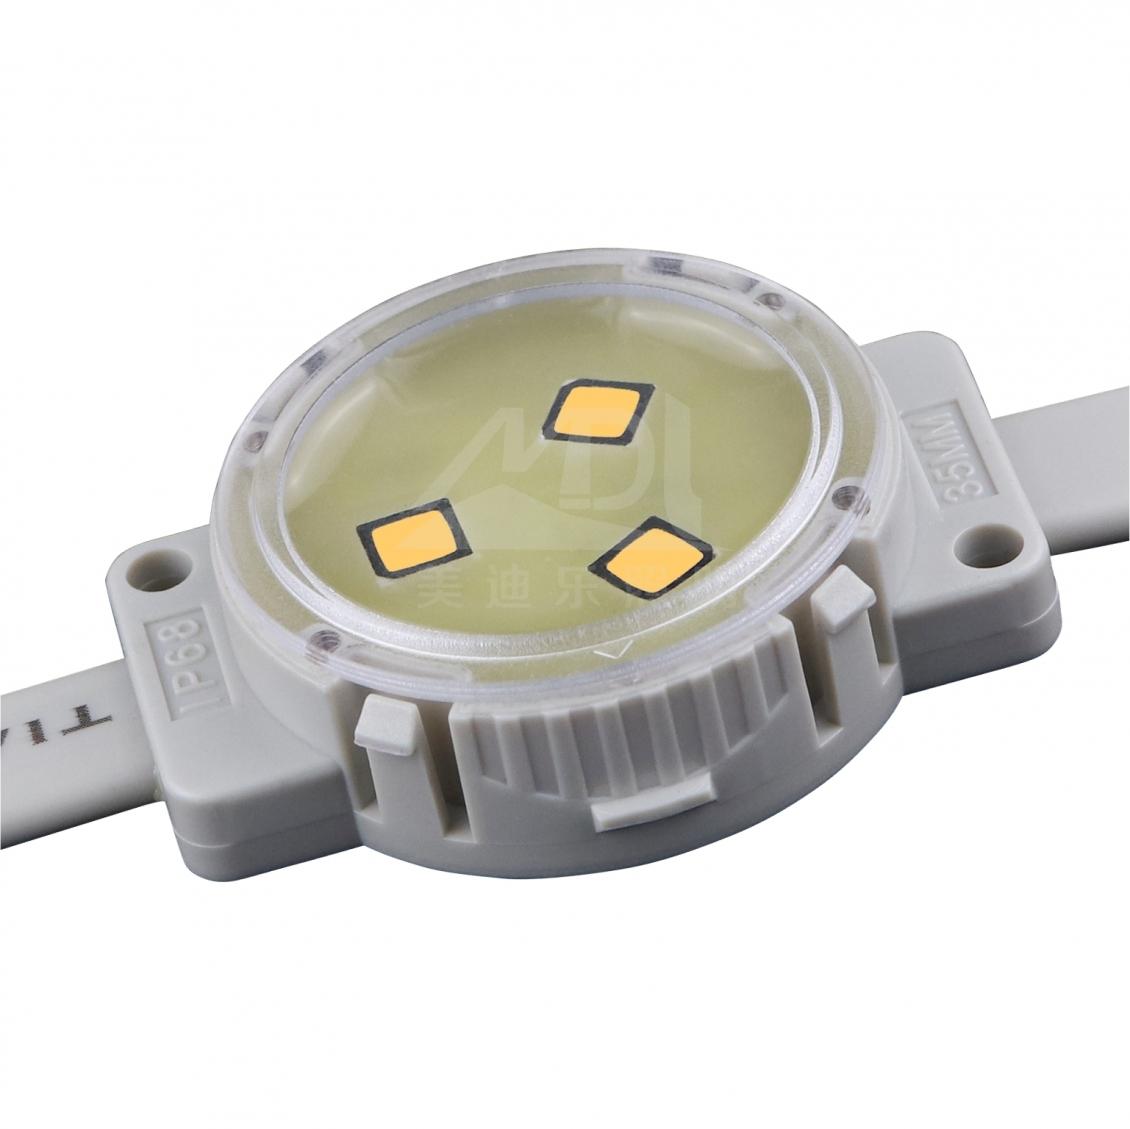 led点光源有变幻的色彩照明效果,能满足你的需求